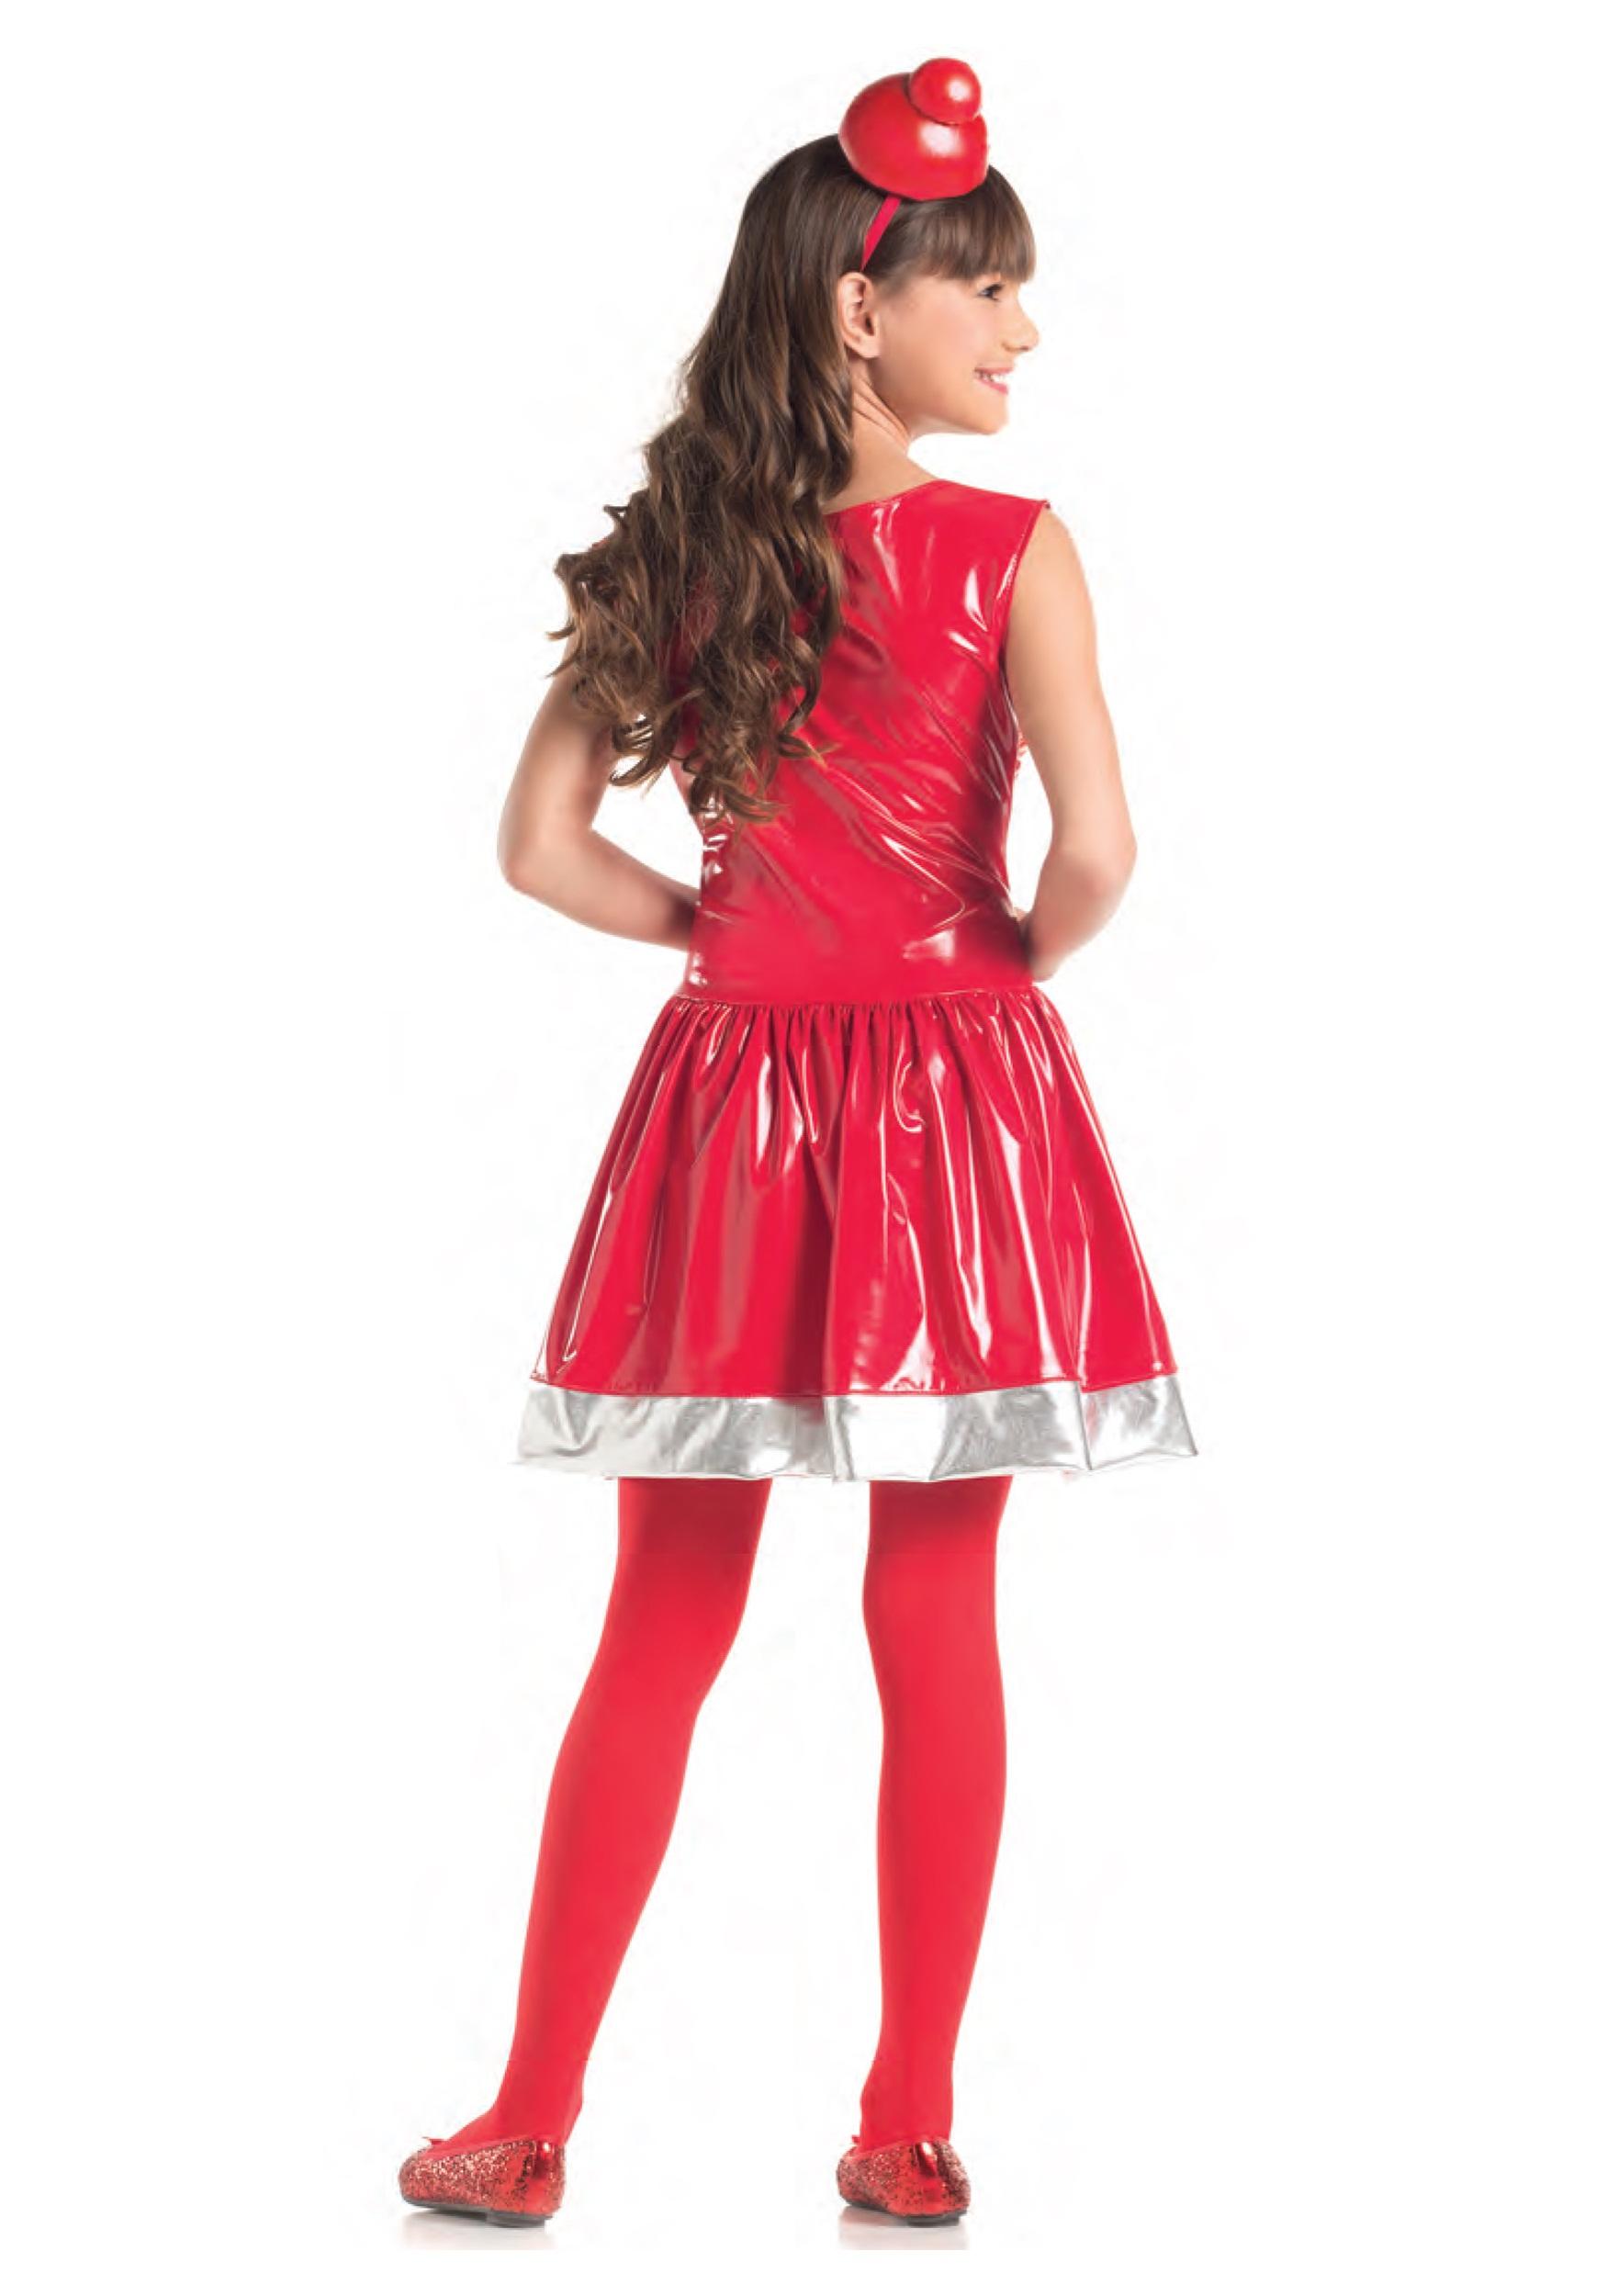 child bubblegum cutie costume child bubblegum cutie costume image 2 - Mystical Halloween Costumes